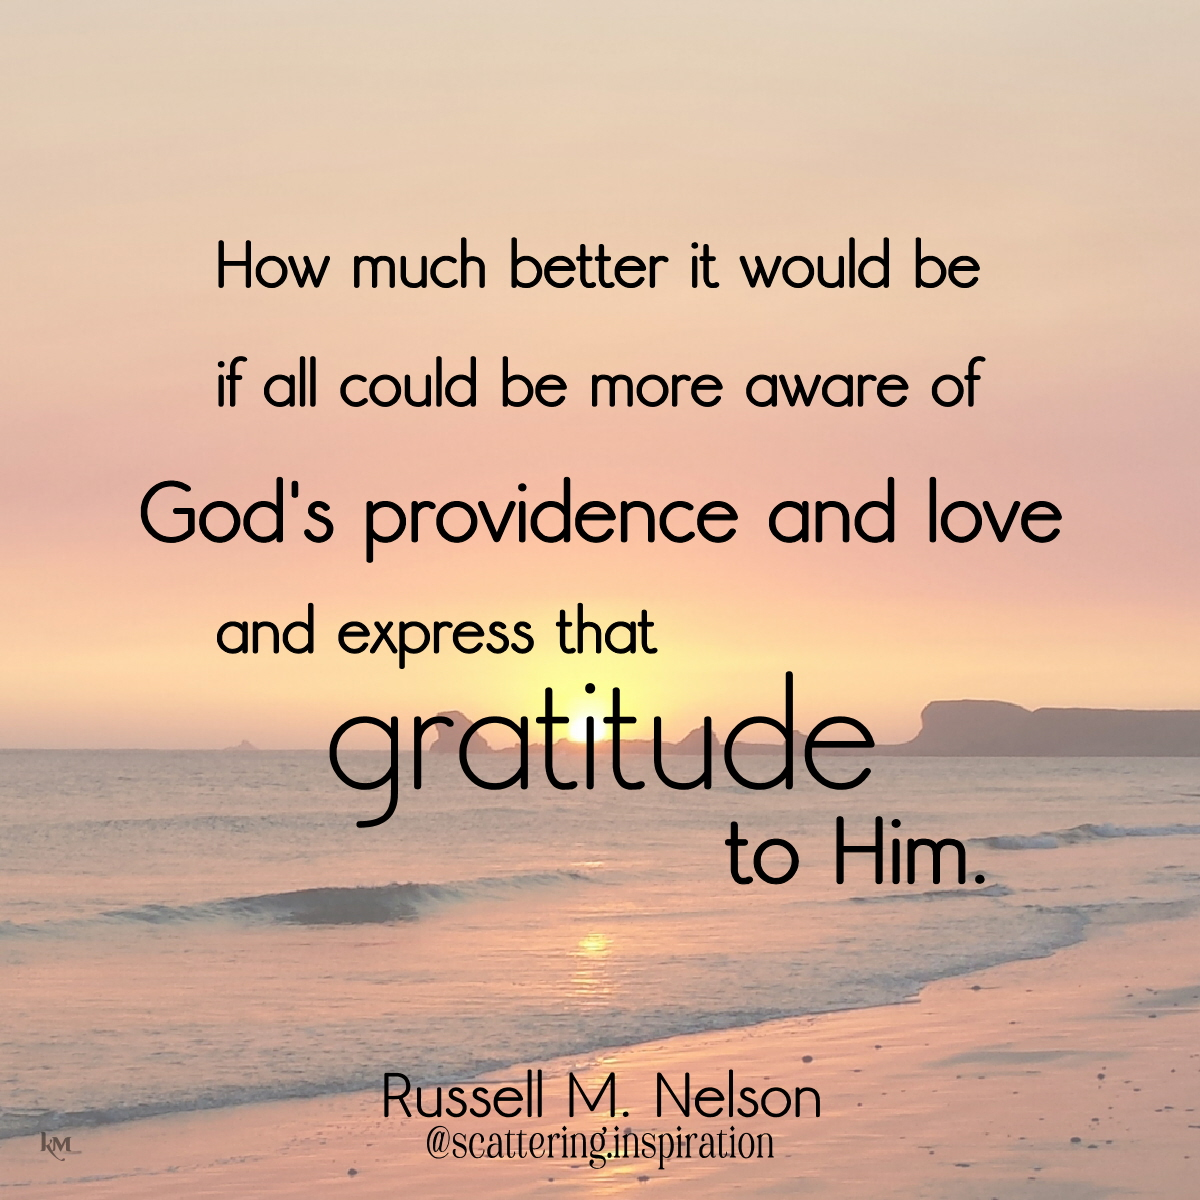 express gratitude to Him